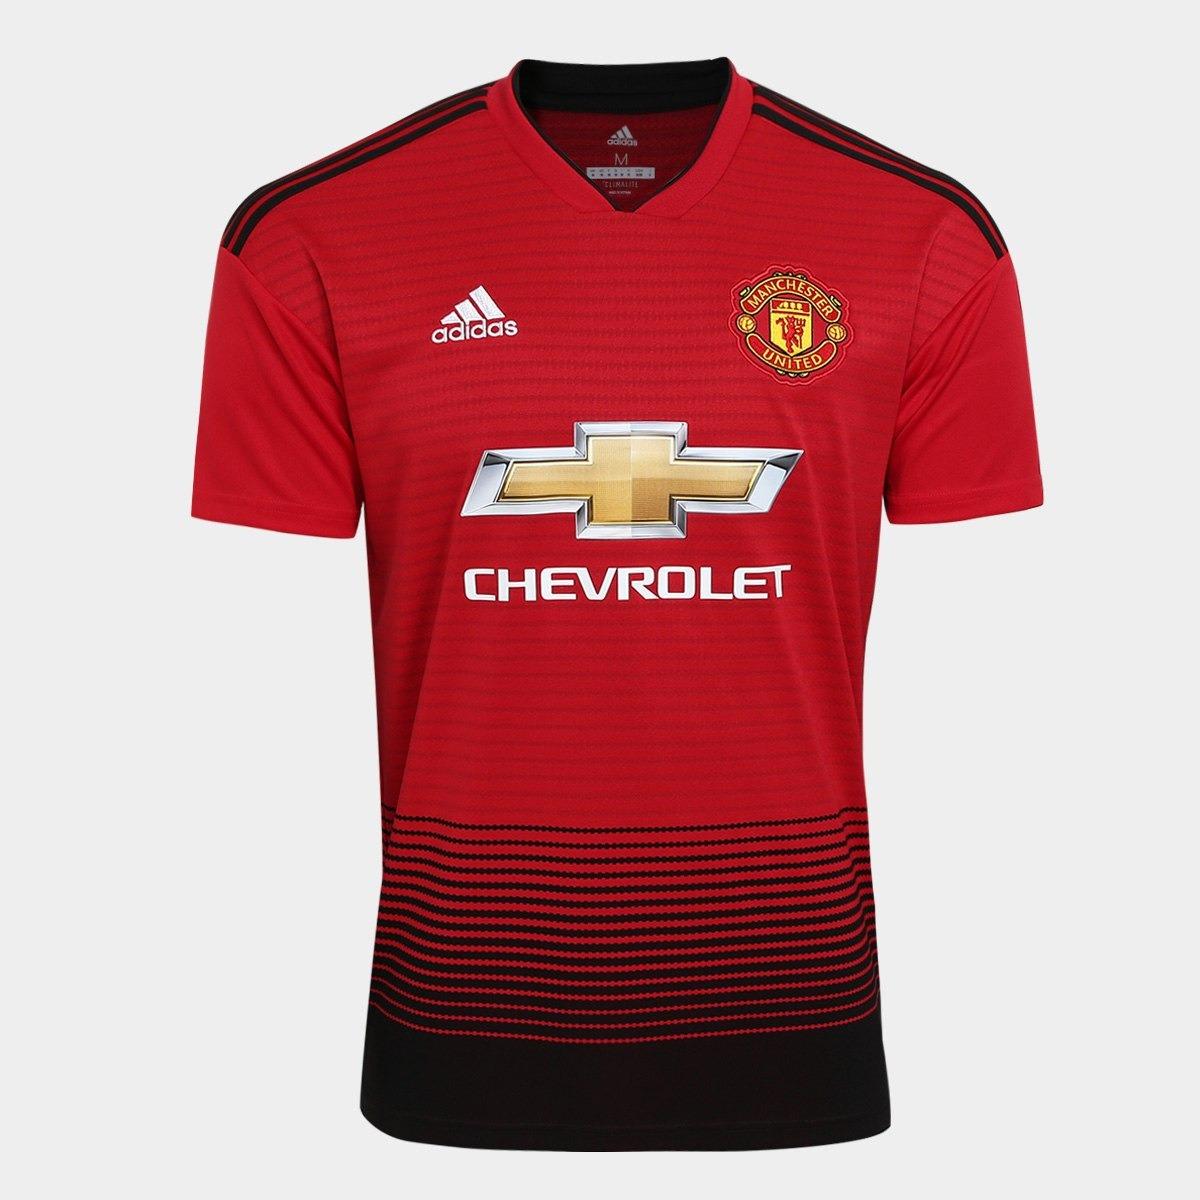 b9adc770c camisa manchester united 2018 2019 alexis lukaku pogba. Carregando zoom.